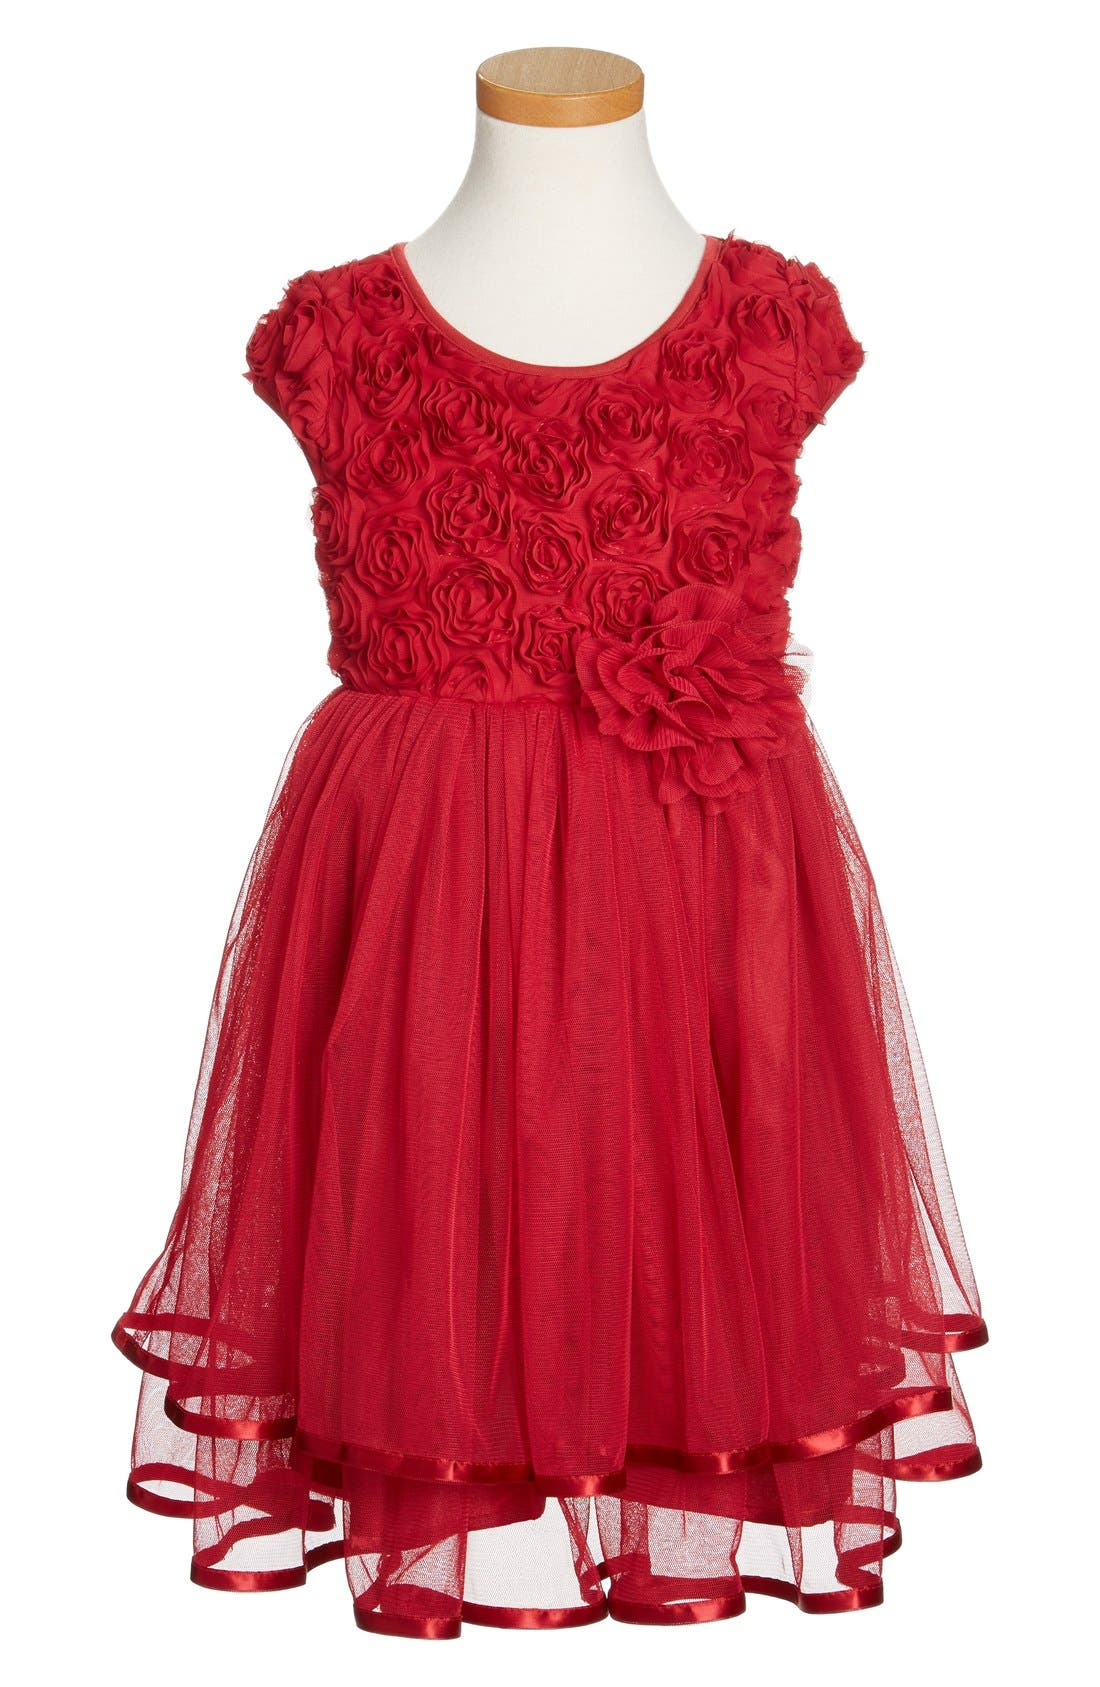 Ribbon Rosette Tulle Dress,                             Main thumbnail 1, color,                             Burgundy